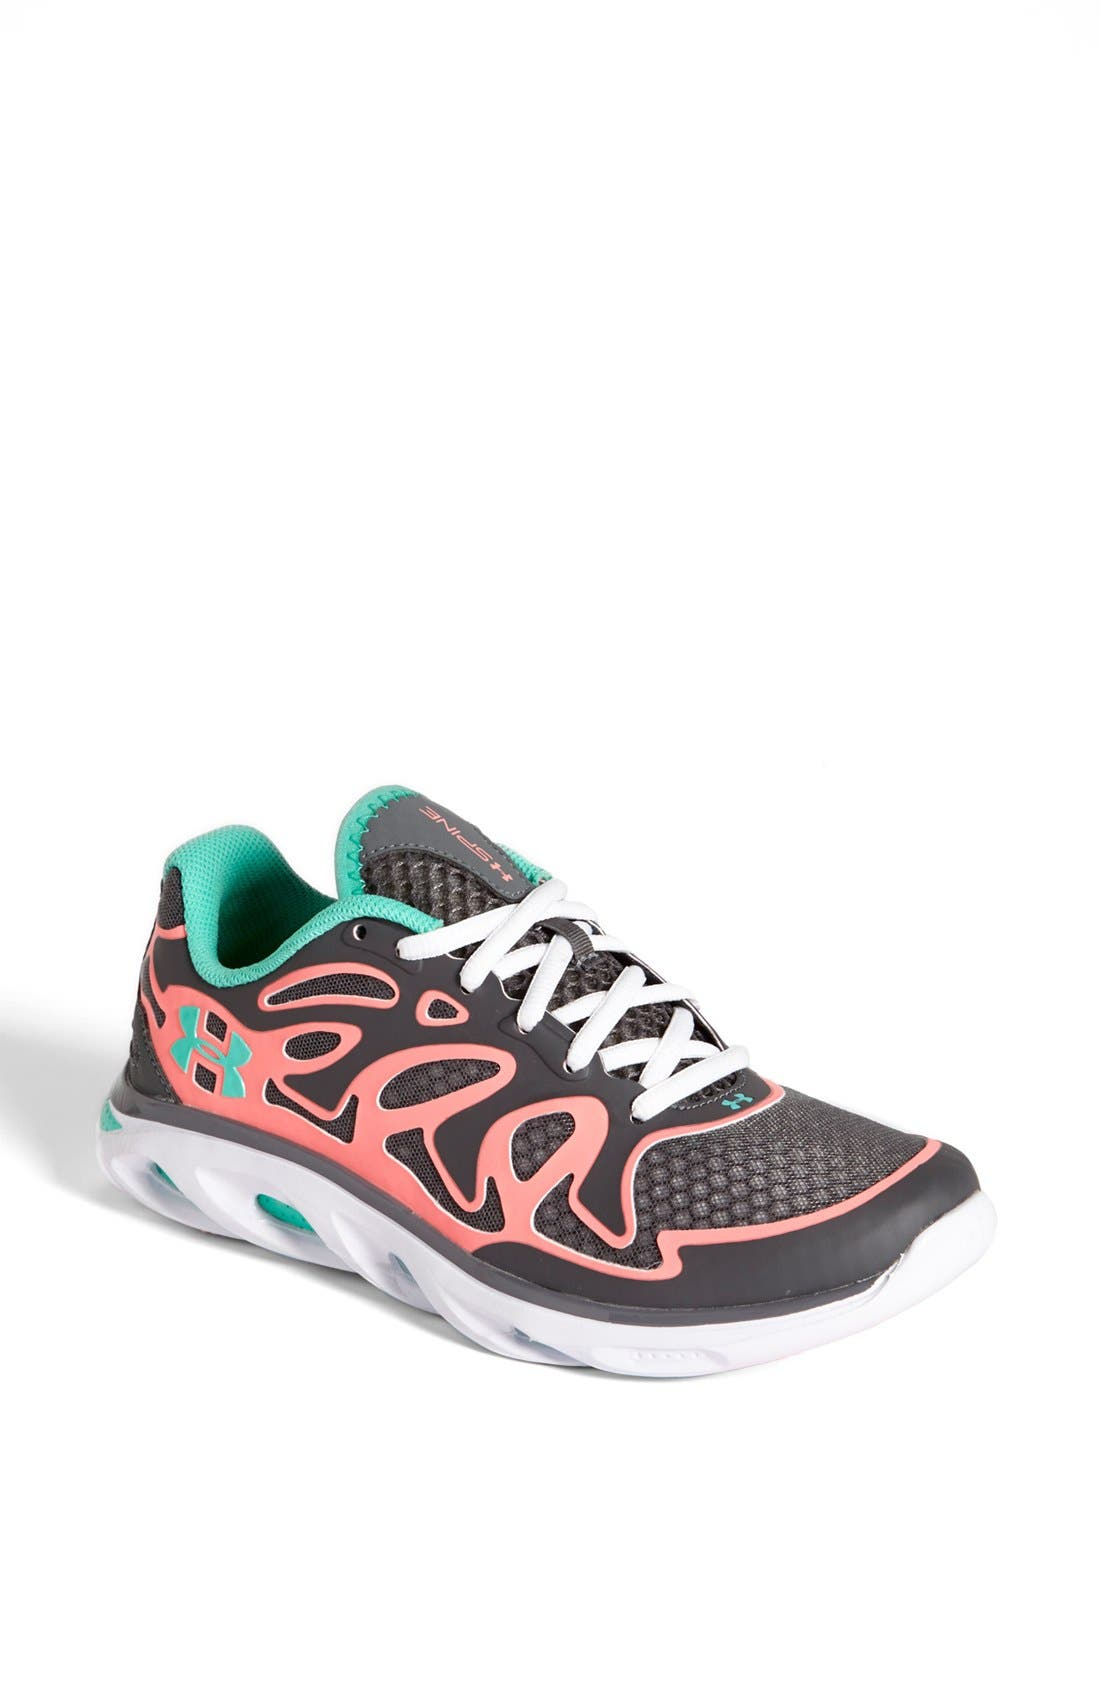 Main Image - Under Armour 'Spine™ Evo' Running Shoe (Women)